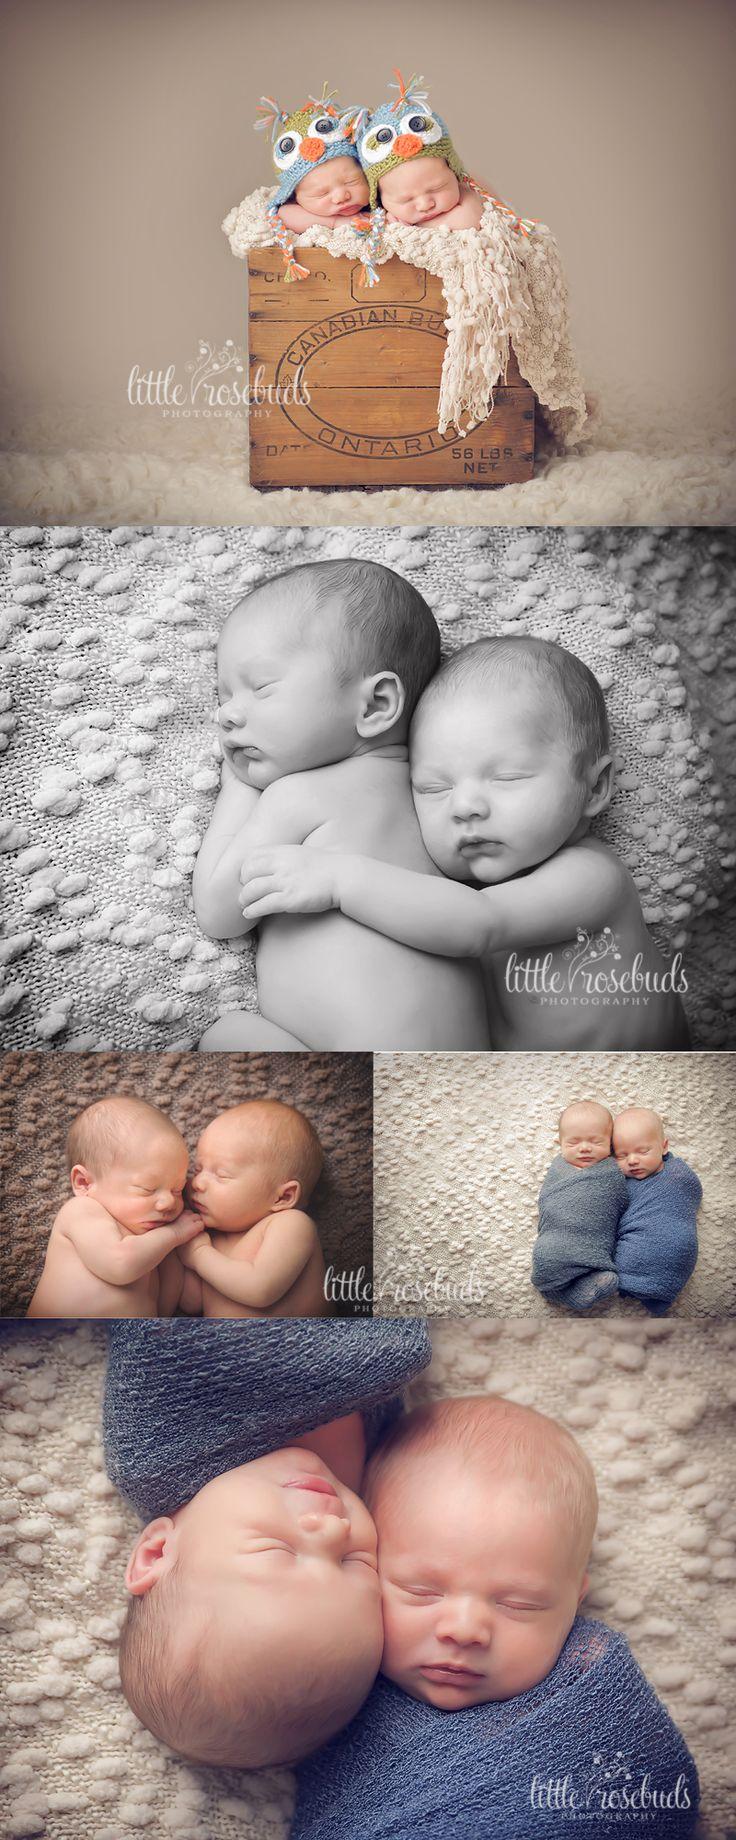 newborn twins photography,  Go To www.likegossip.com to get more Gossip News!